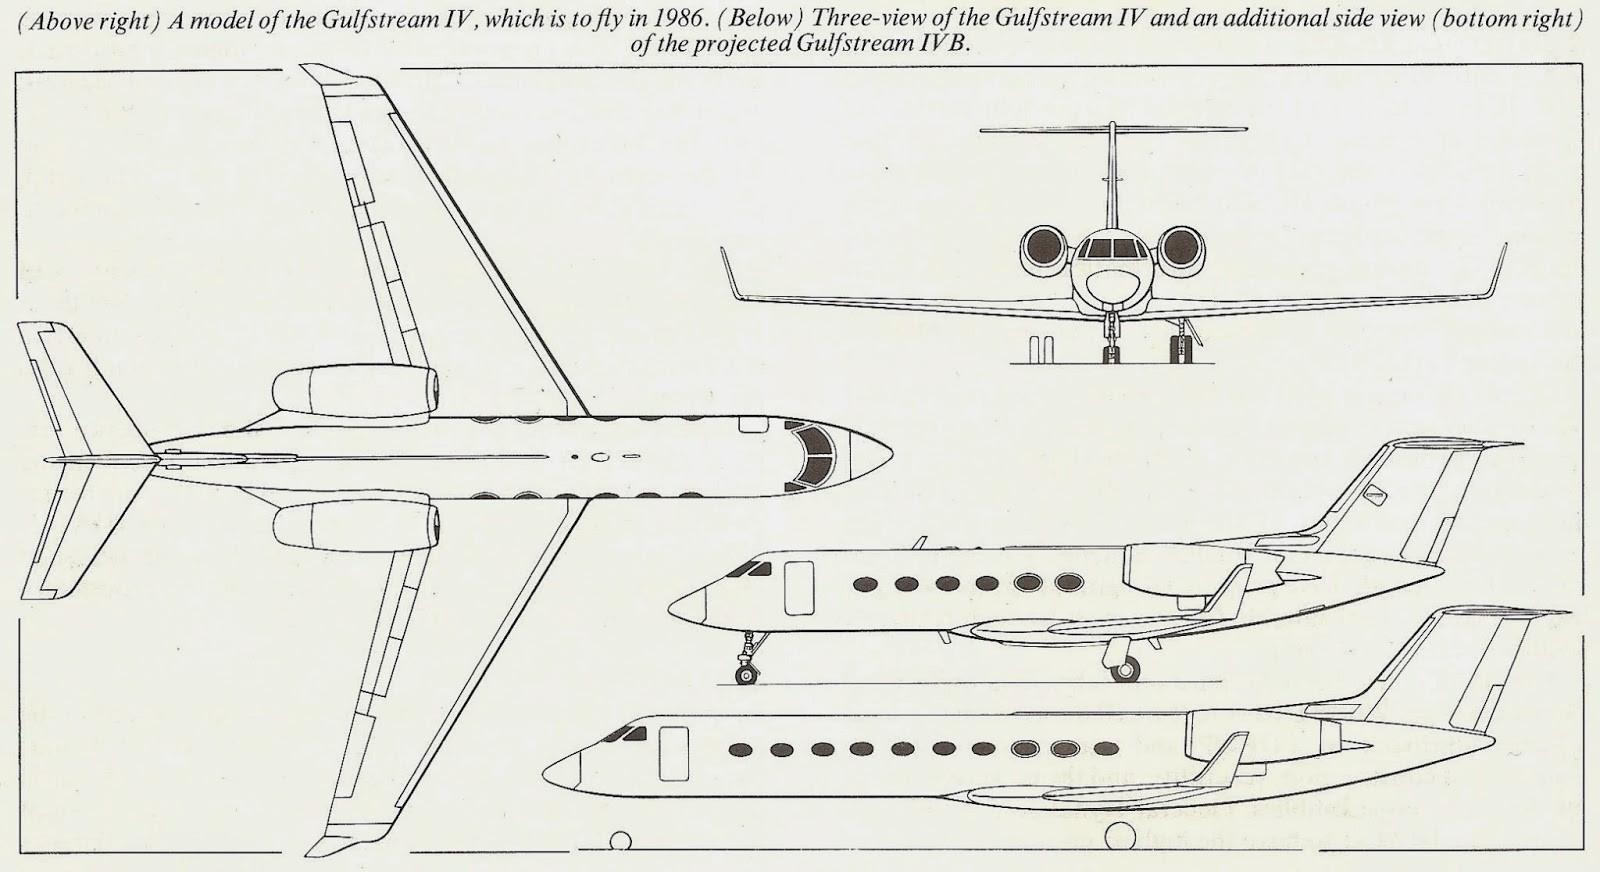 Gulfstream Iv B